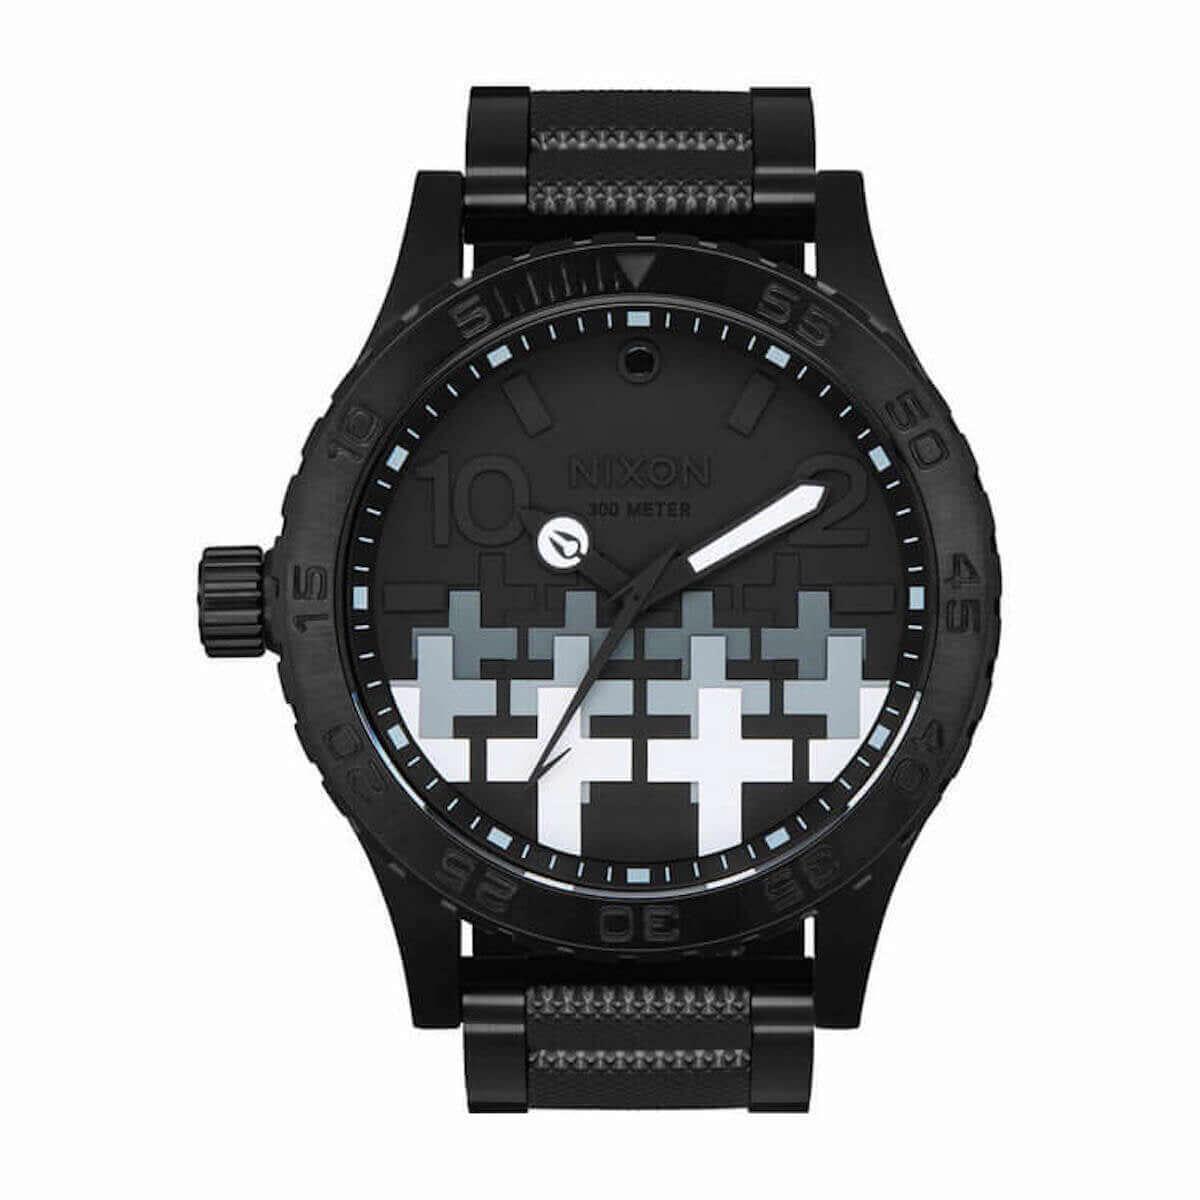 METALLICA X NIXON メタリカの名盤が腕時計に! music181112_nixon-metallica_10-1200x1200